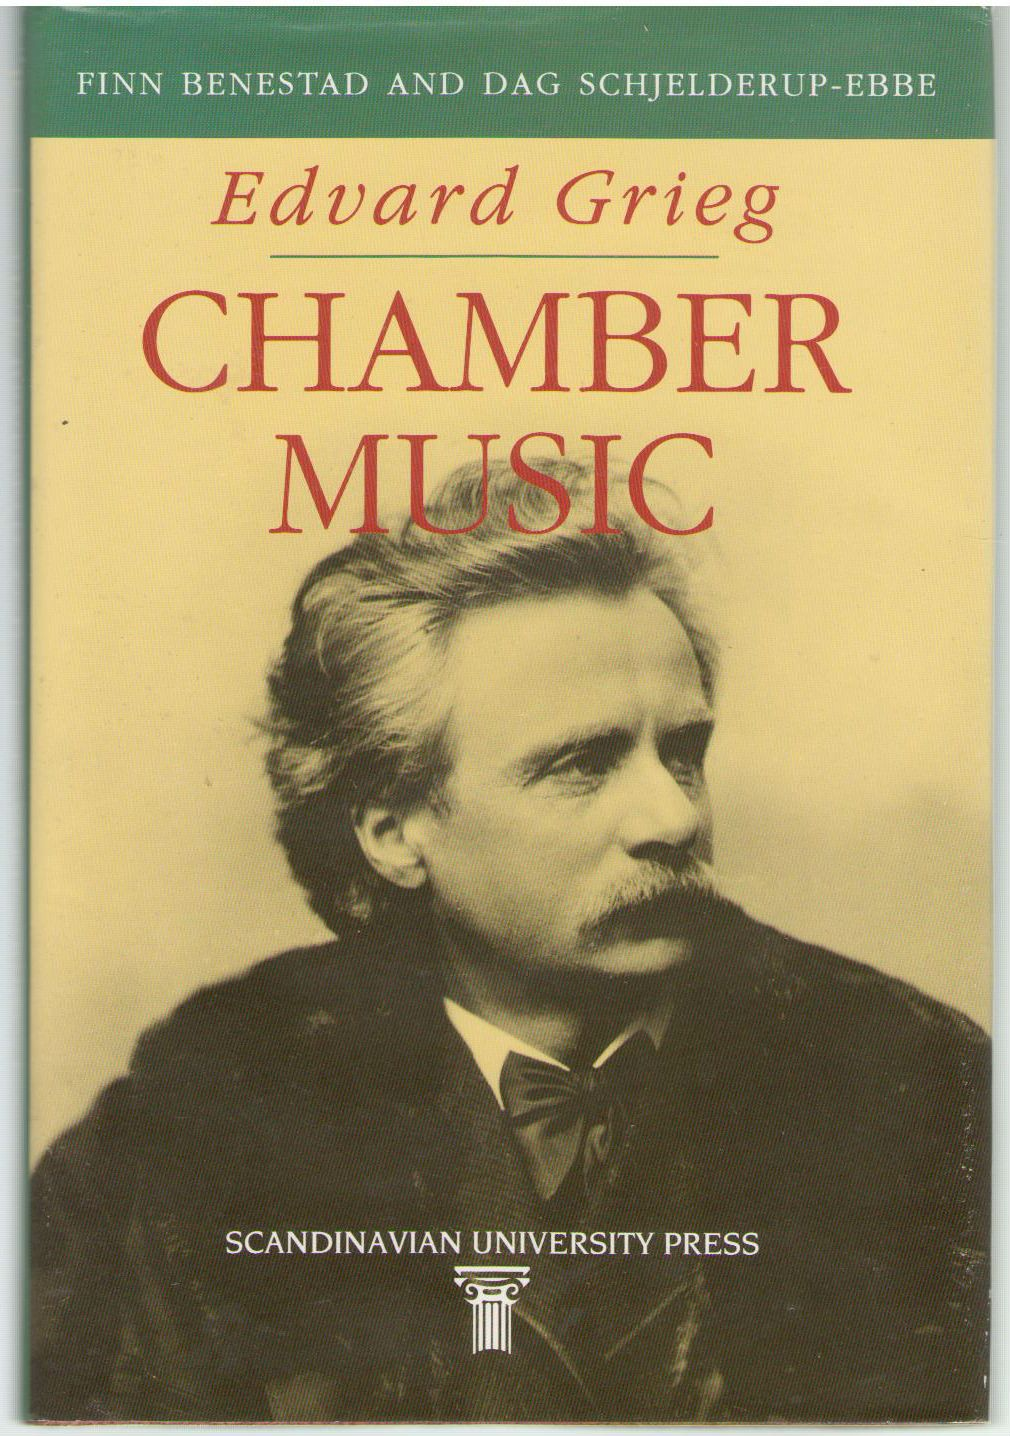 Edvard Grieg Chamber Music: Nationalism, Universality, Individuality, Benestad, Finn; Schjelderup-Ebbe, Dag